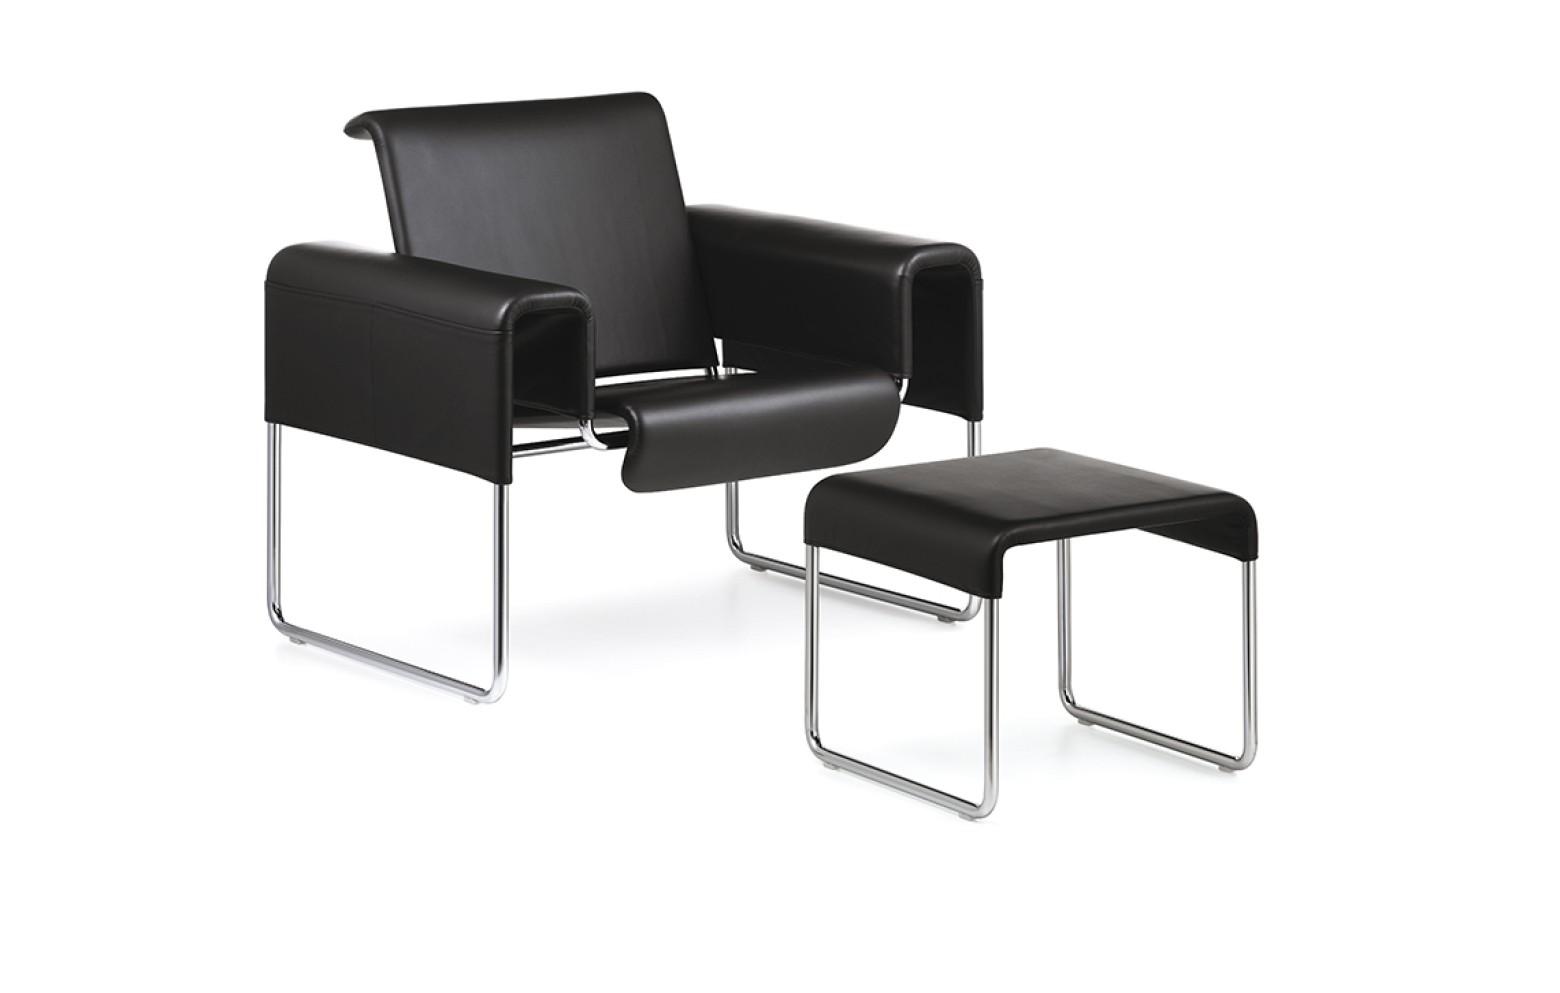 mood sessel liegen polsterm bel who 39 s perfect. Black Bedroom Furniture Sets. Home Design Ideas